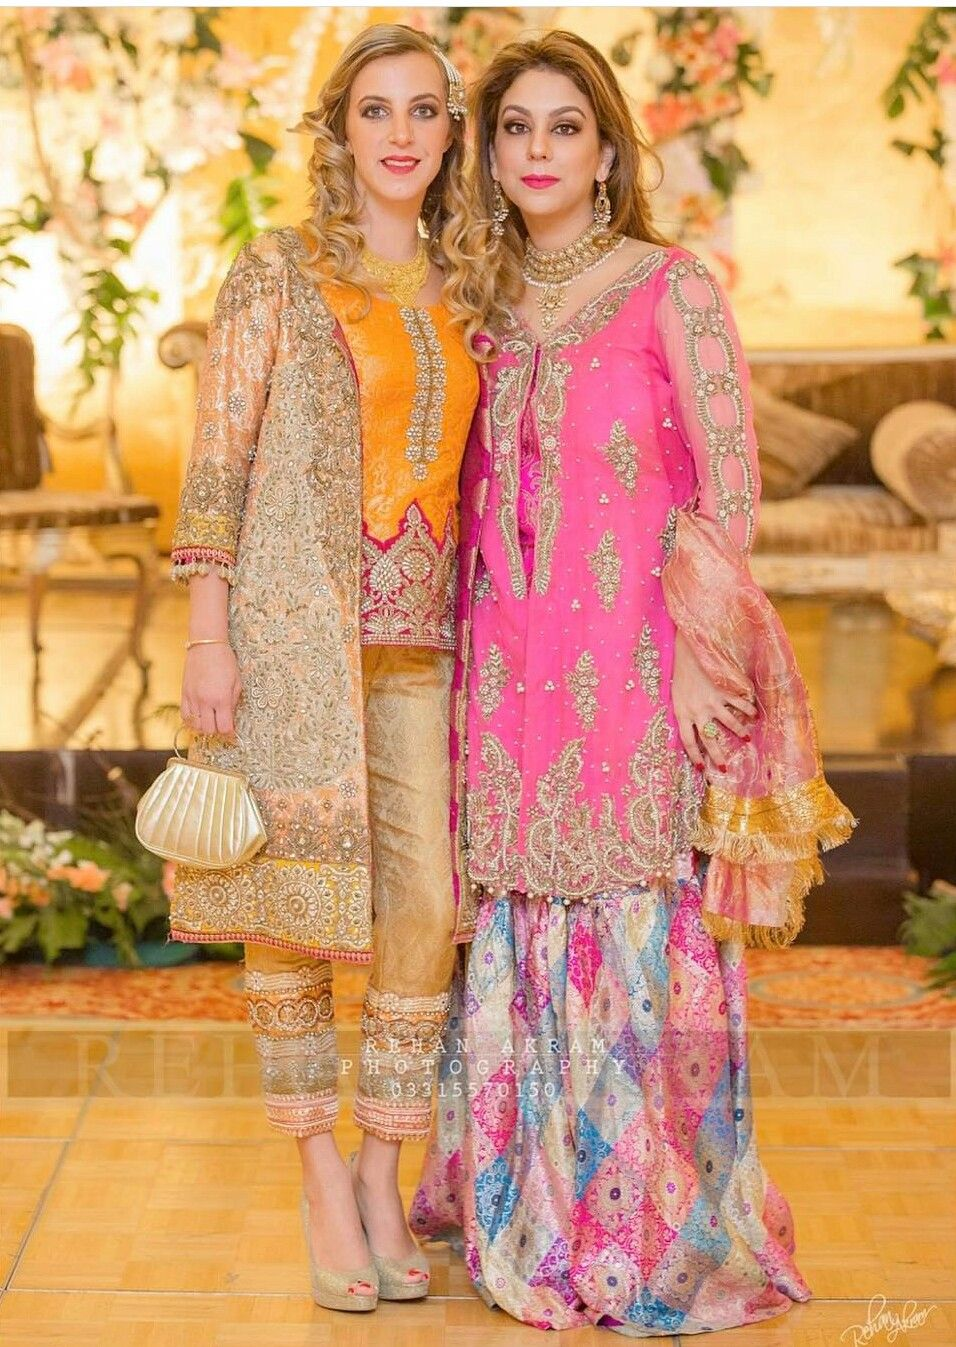 Pin de Nimra Abdullah en clothes | Pinterest